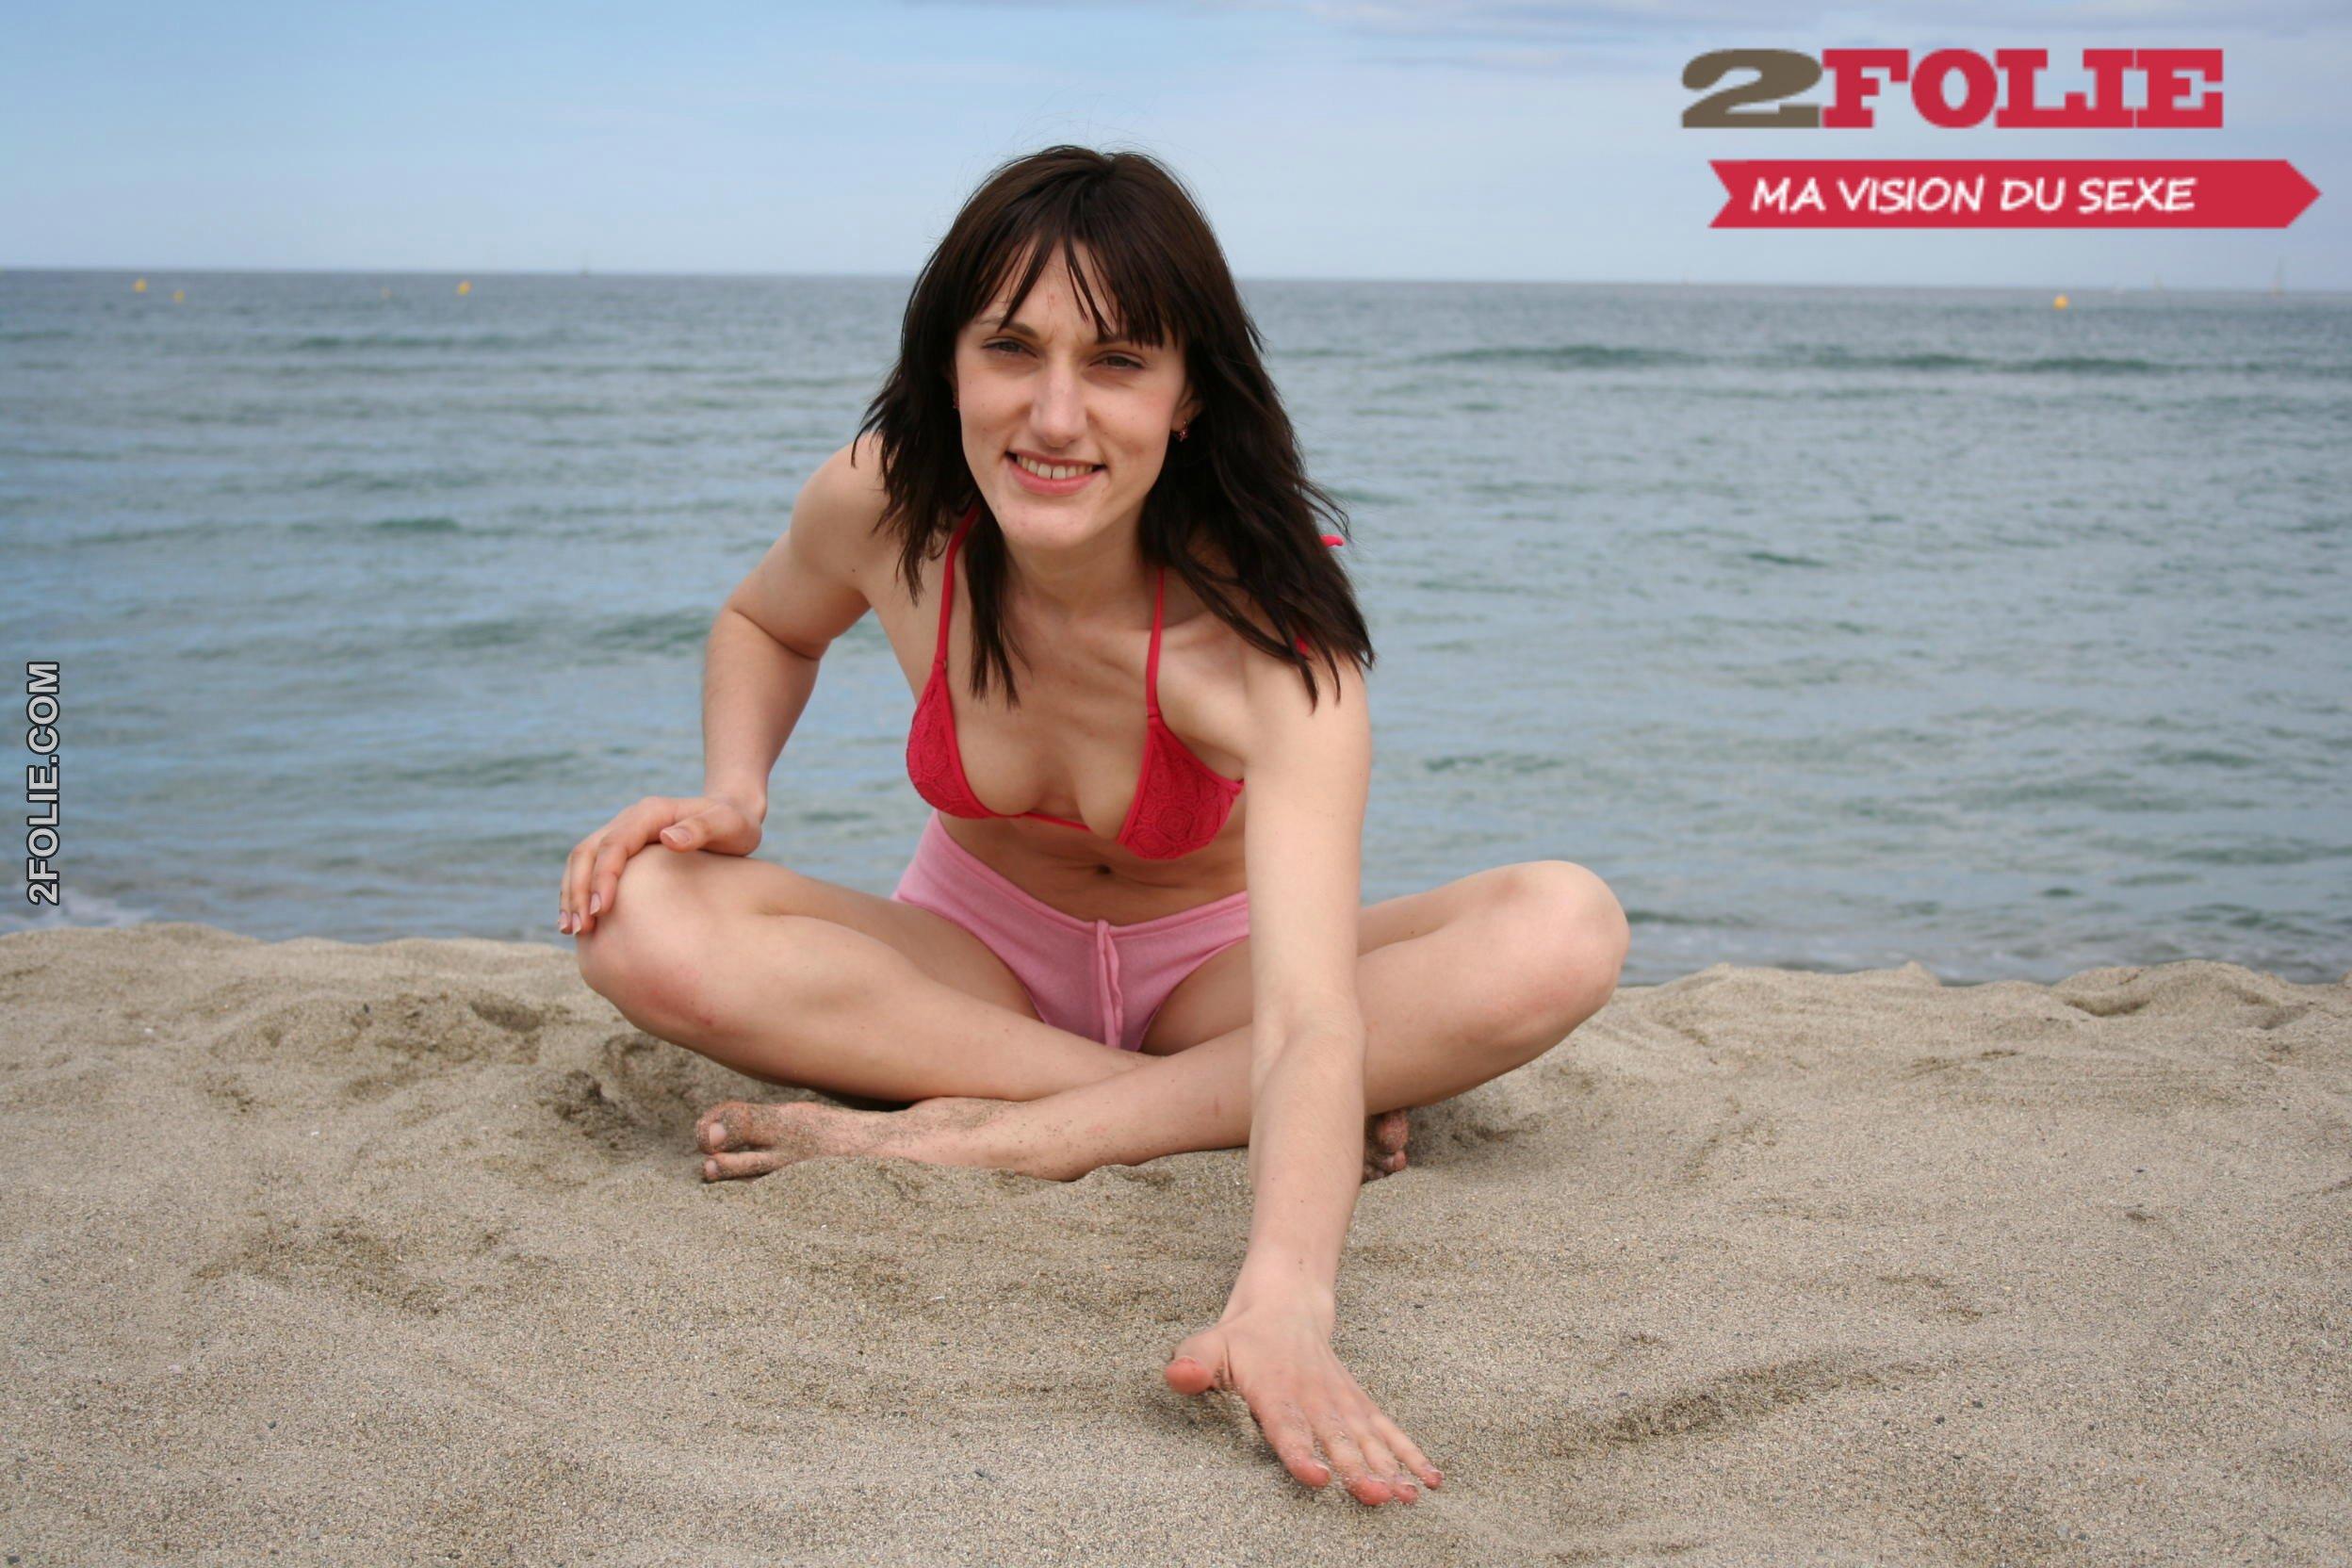 Belle fille bikini